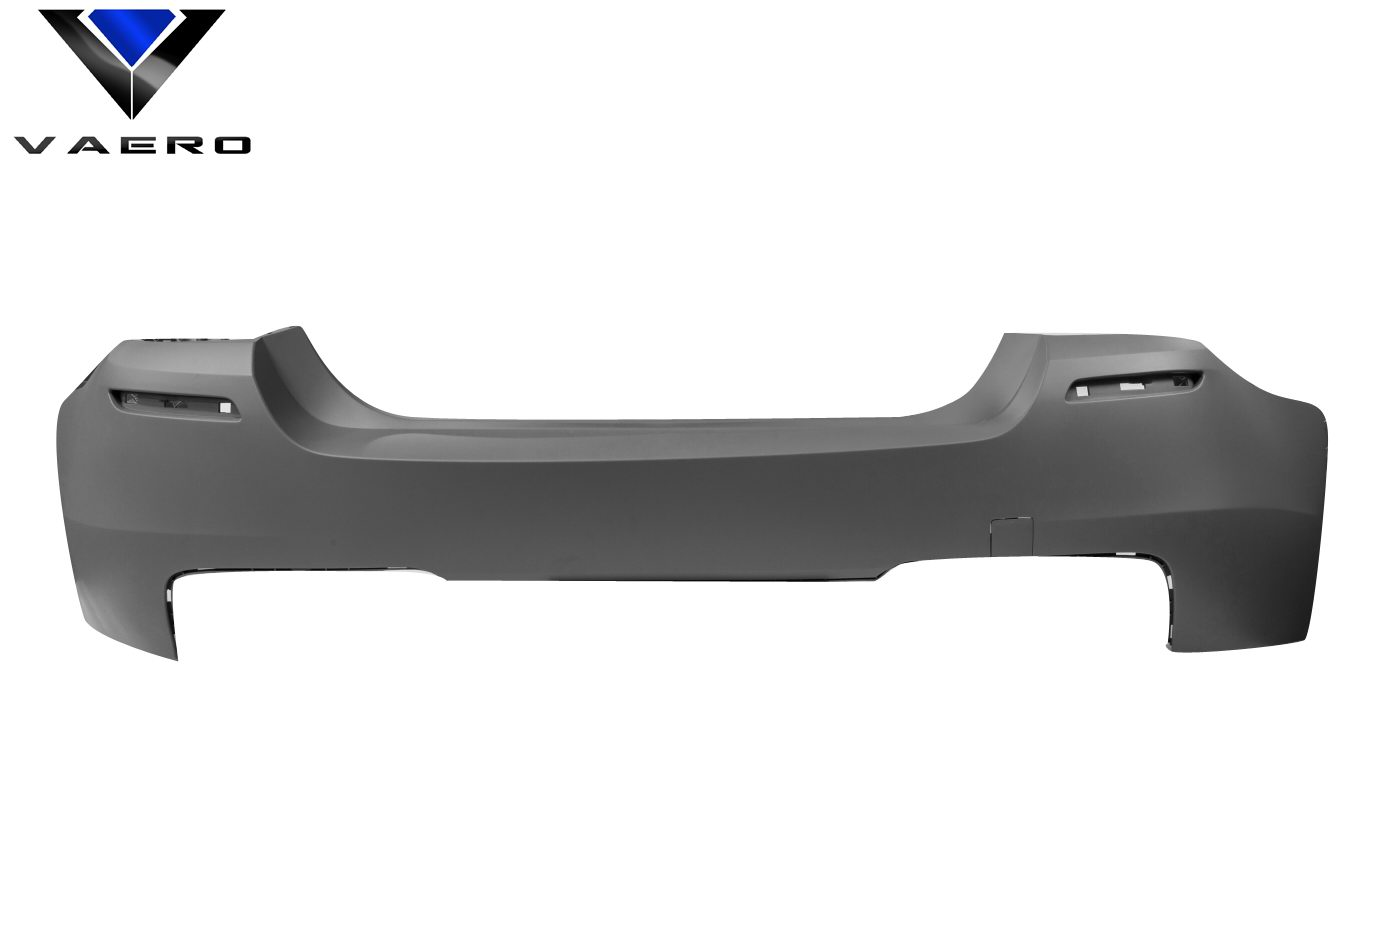 2016 BMW 5 Series 4DR - Polypropylene Rear Bumper Bodykit - BMW 5 Series F10 4DR Vaero M5 Look Rear Bumper Cover ( without PDC ) - 1 Piece